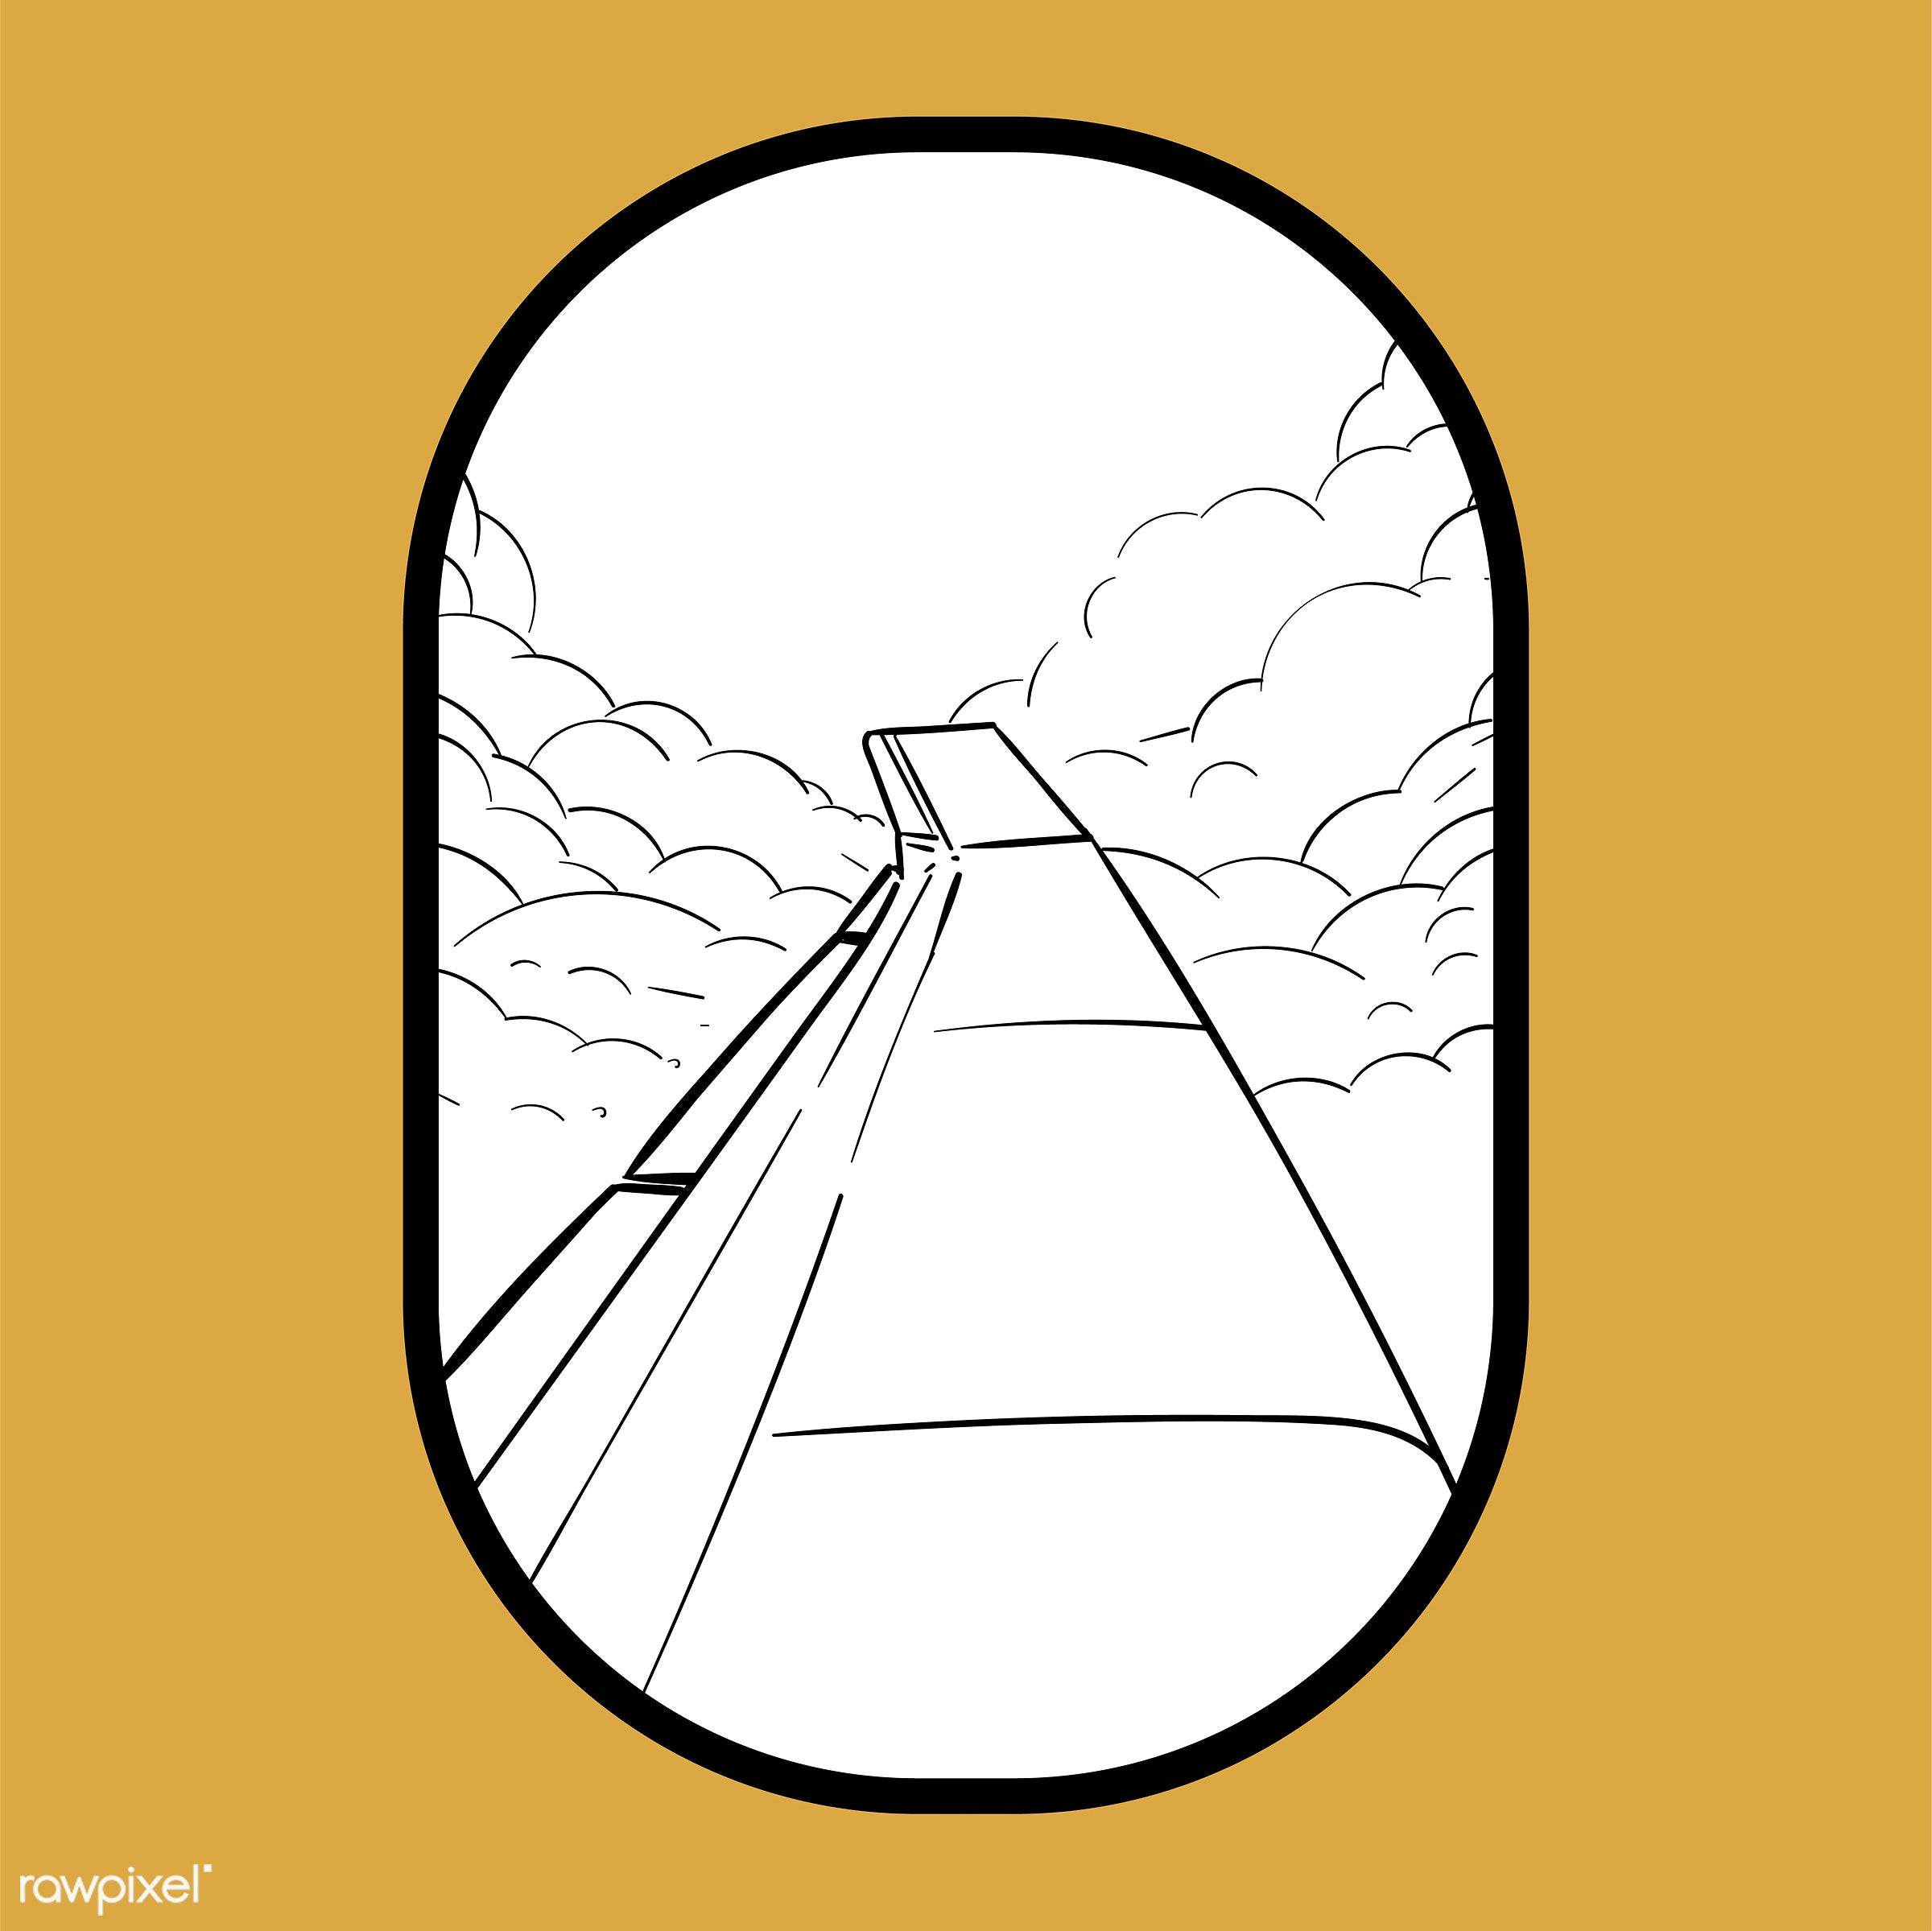 Hand drawing illustration set of wanderlust icons - adventure, airplane, art, artwork, camp, camping, cloud, creative,...